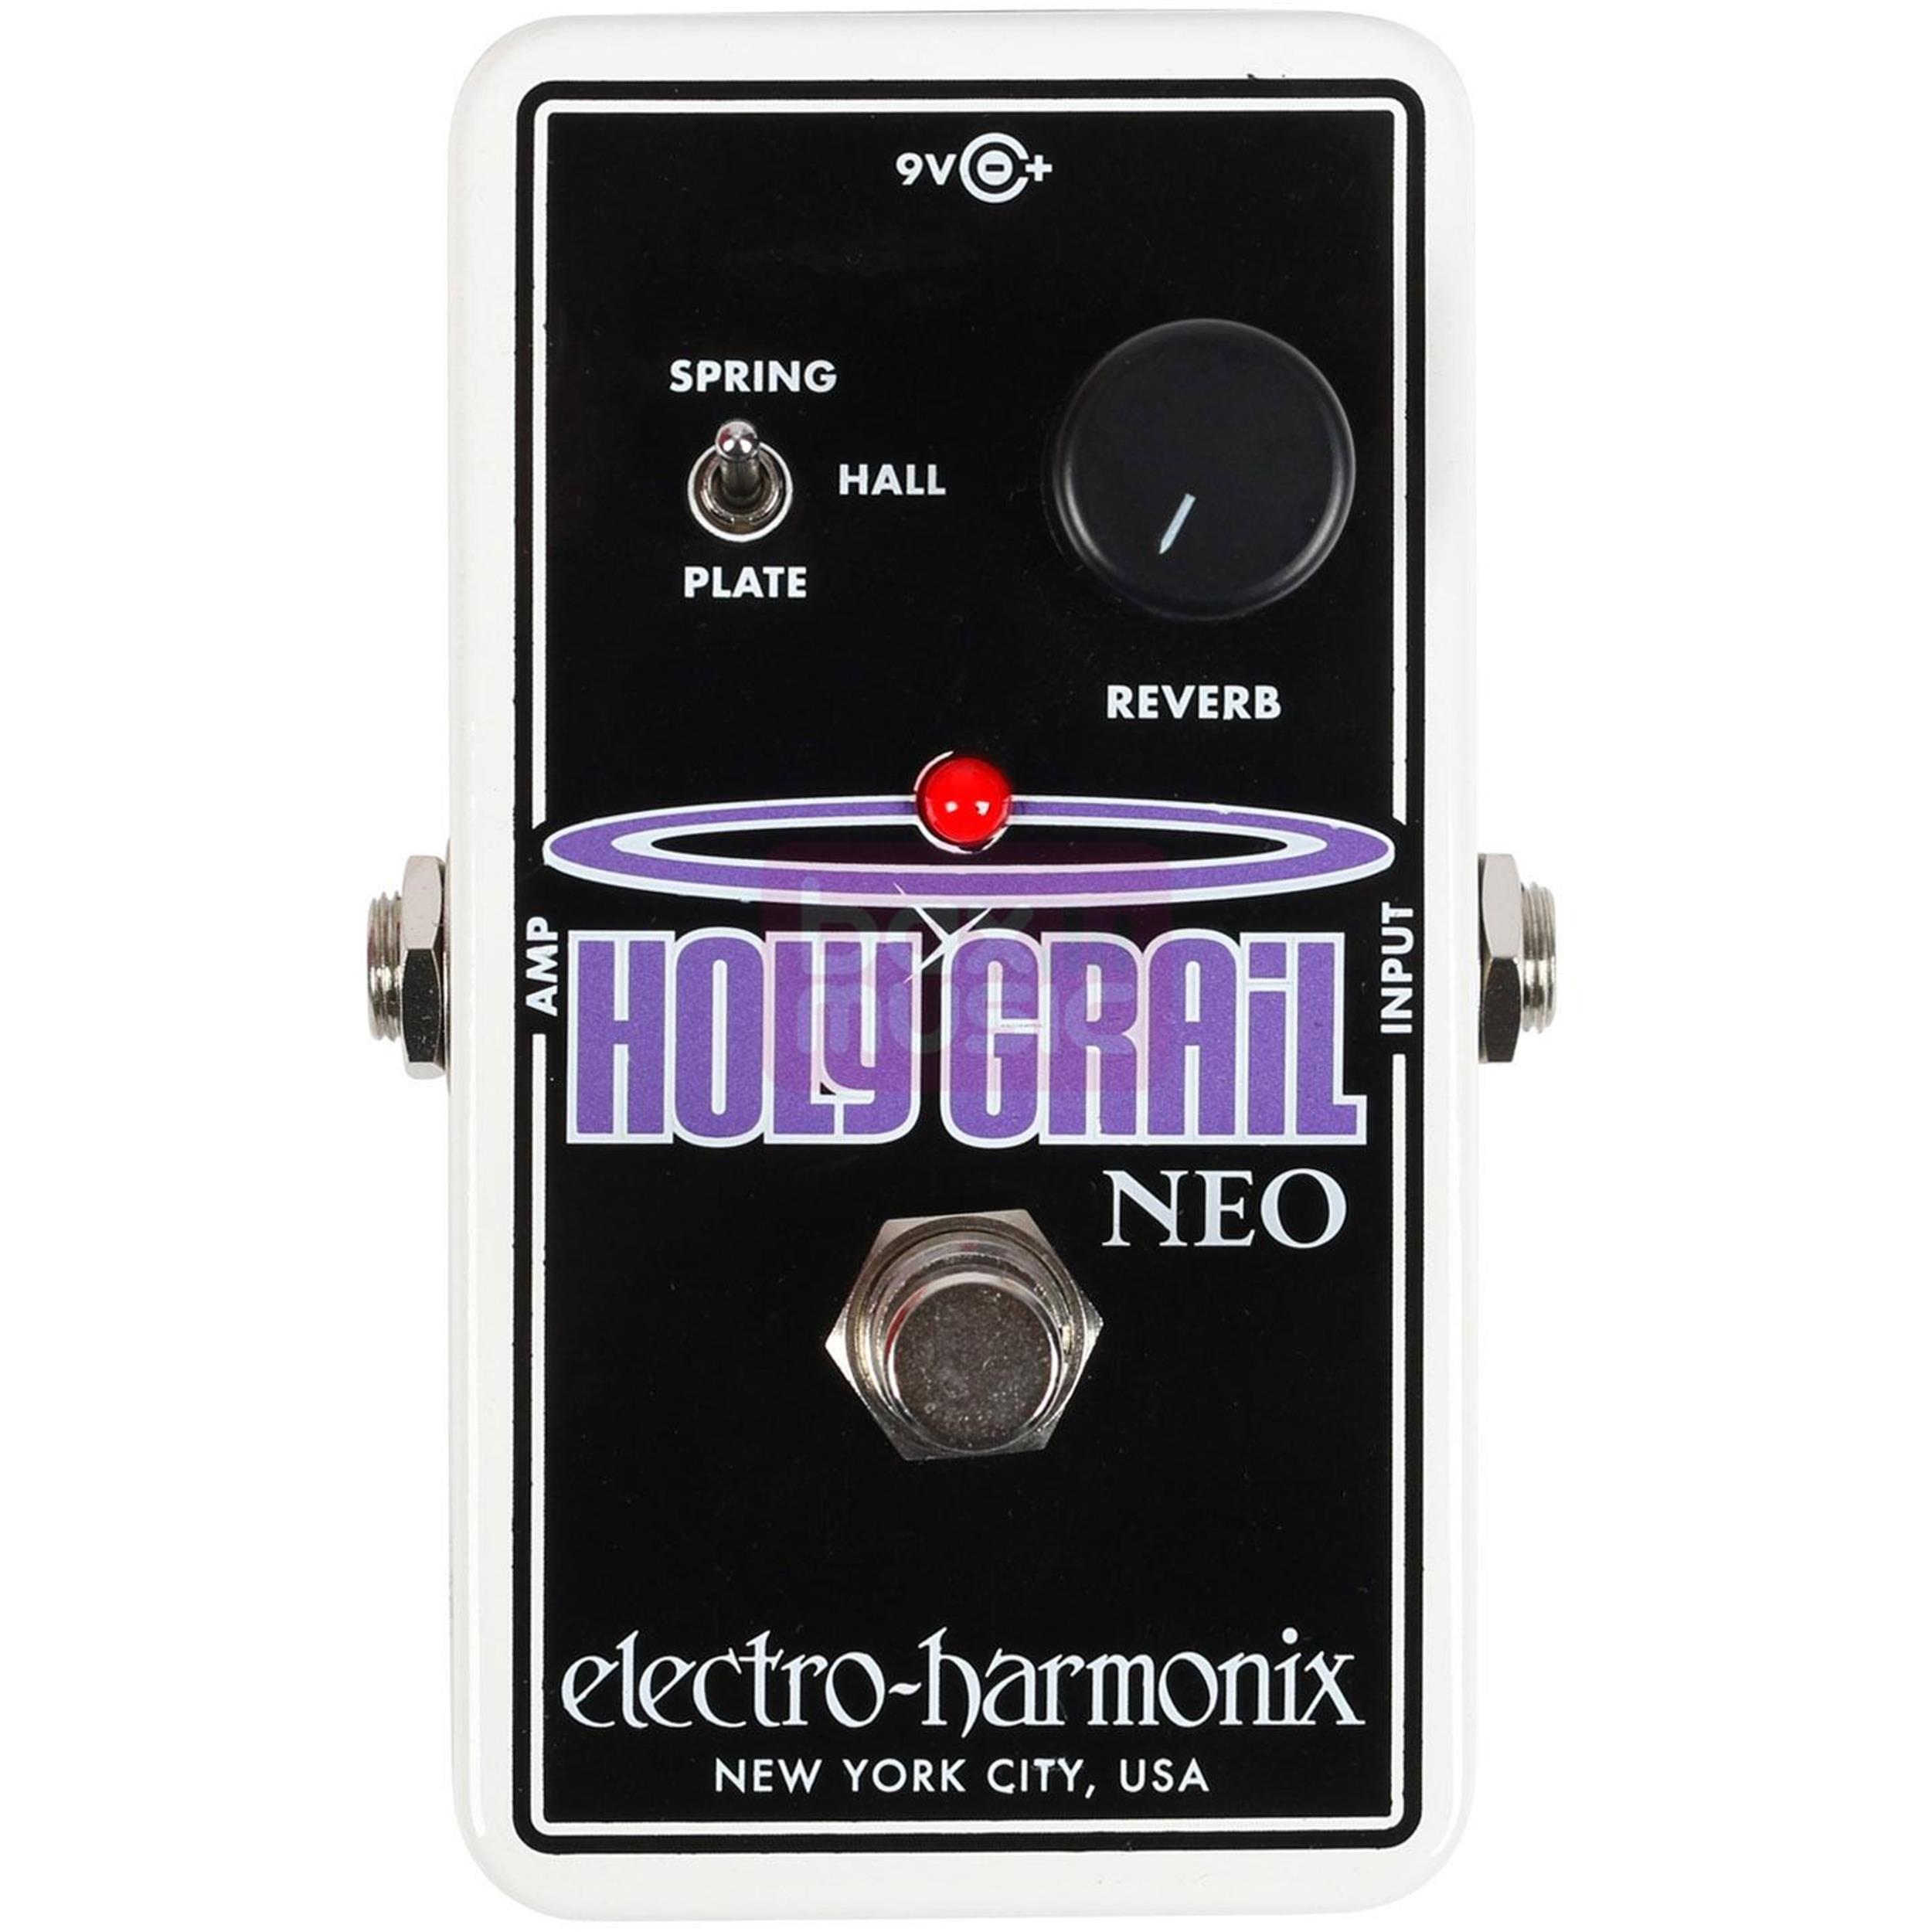 ELECTRO-HARMONIX-HOLY-GRAIL-NEO-sku-14099